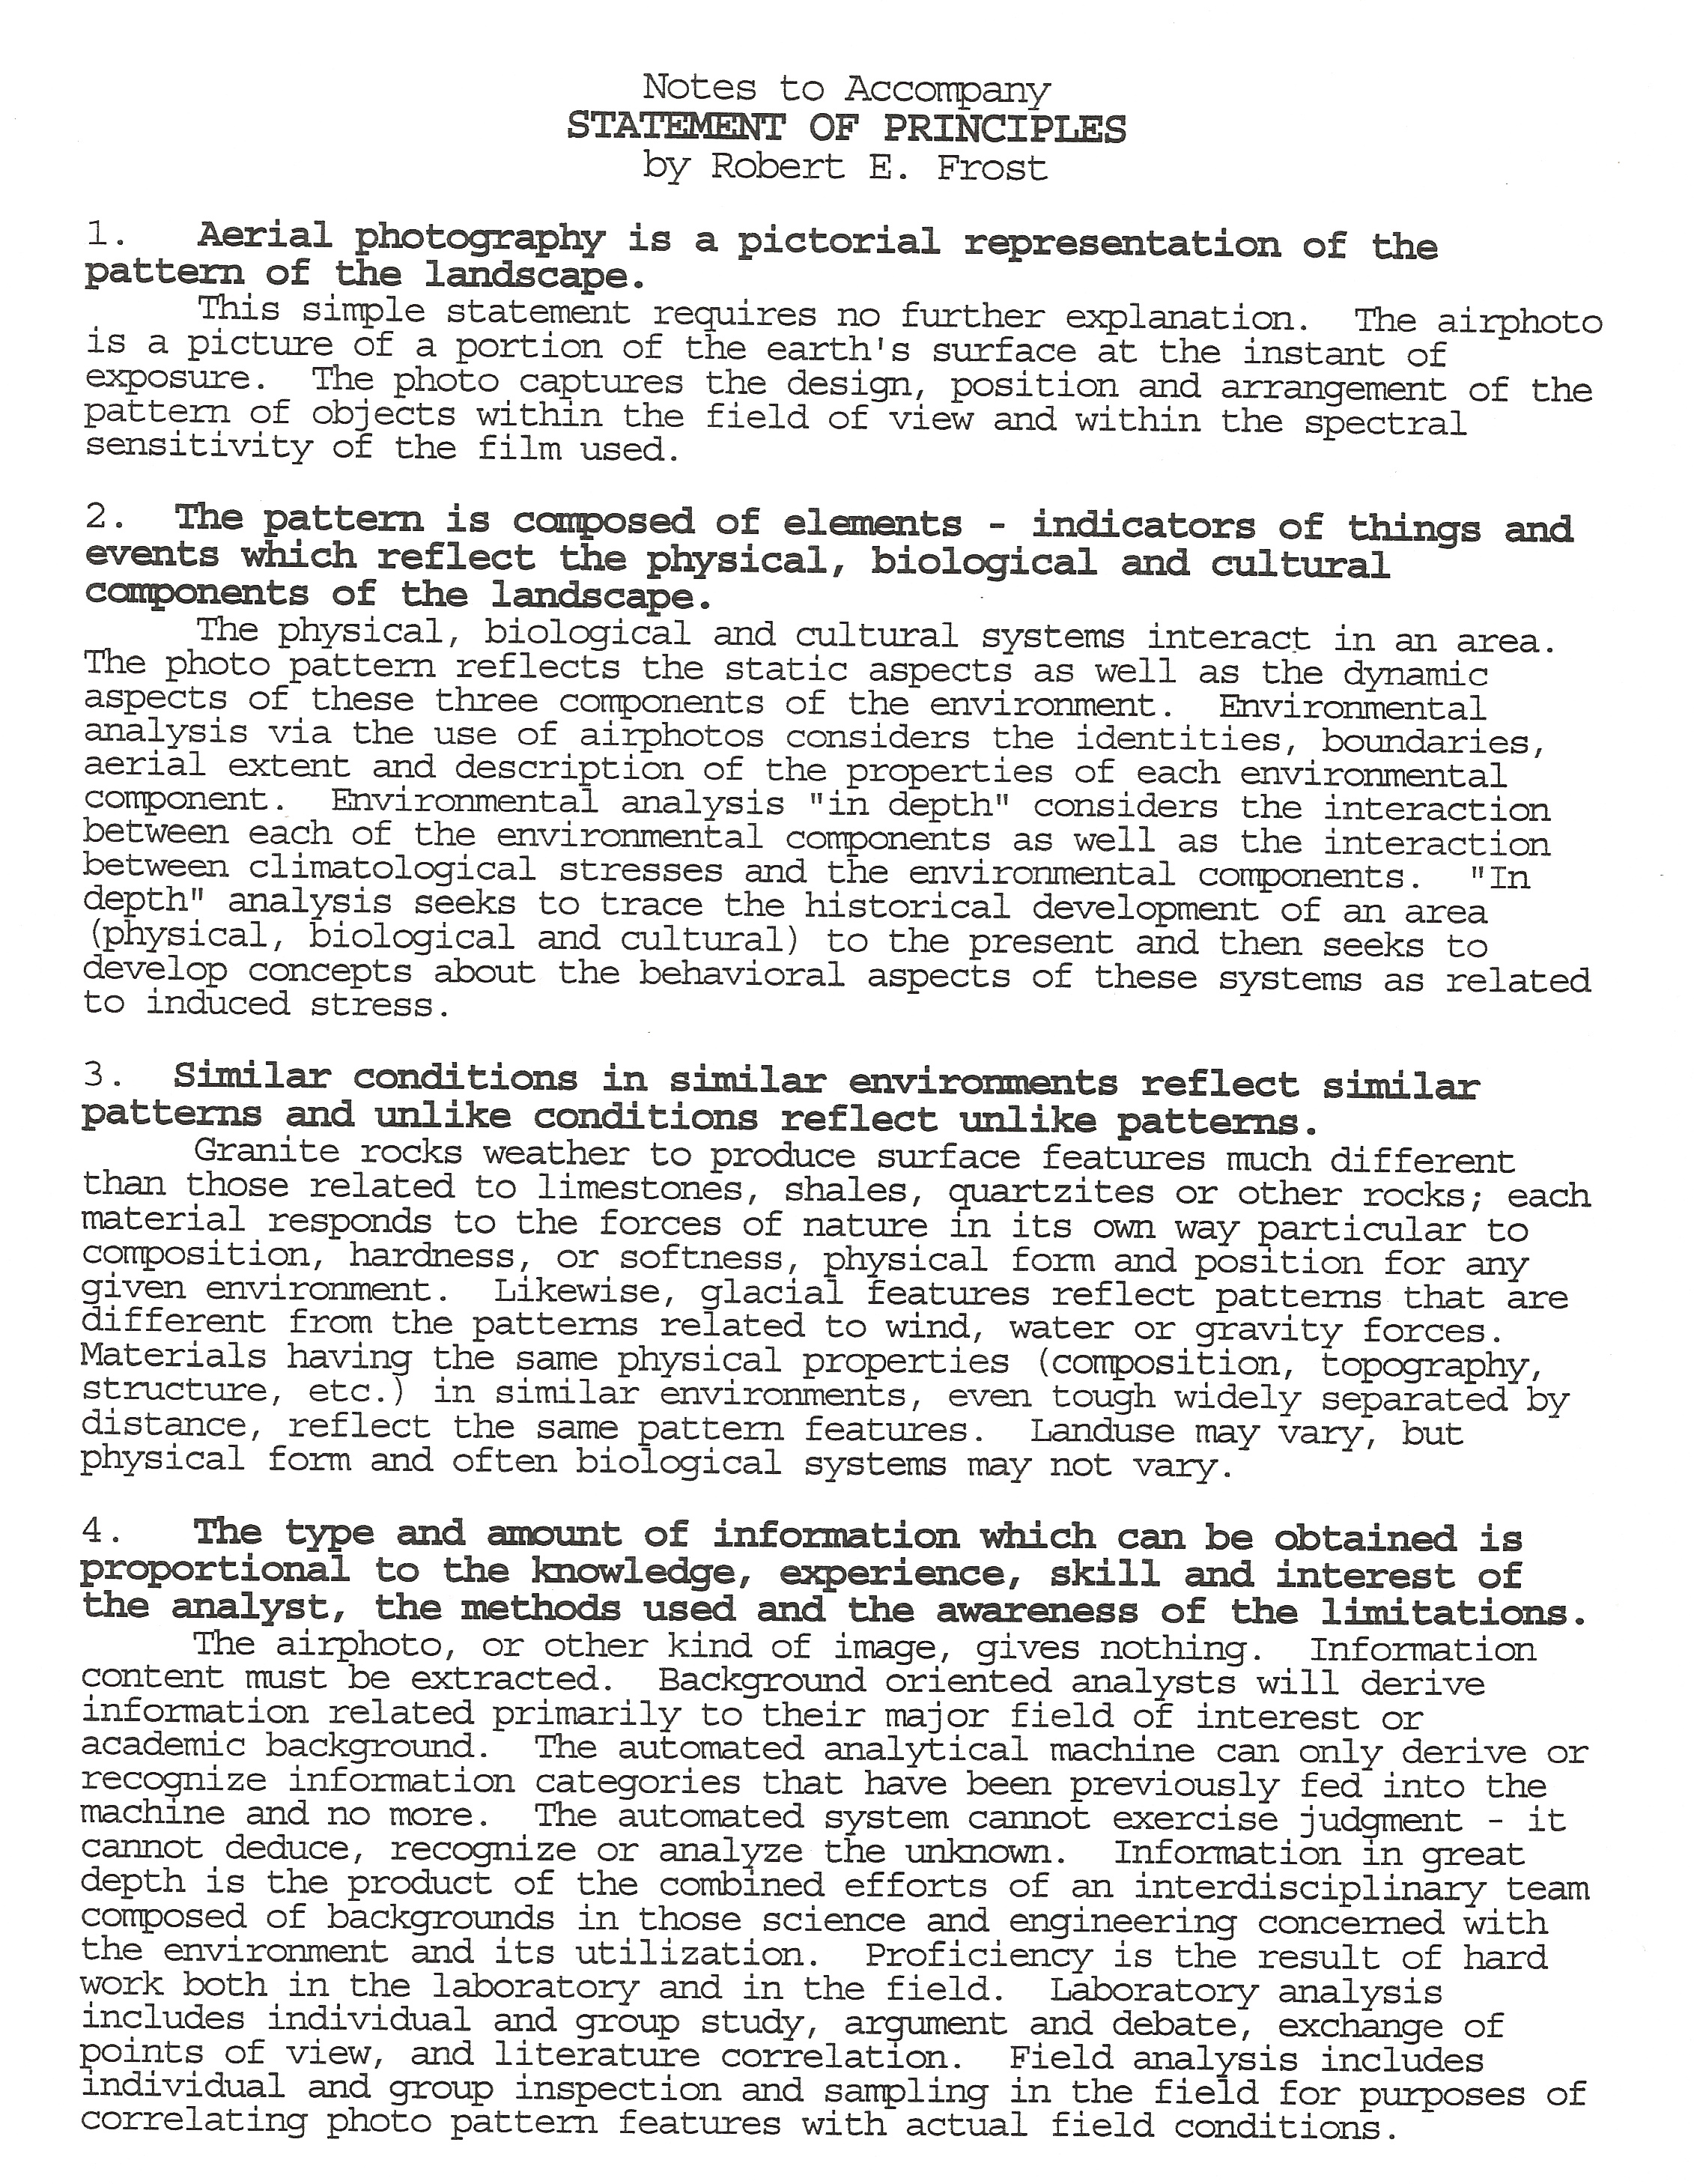 sample thesis statement stem cell research macbeth power essay macbeth essay on power gxart macbeth power abuse of power in macbeth and